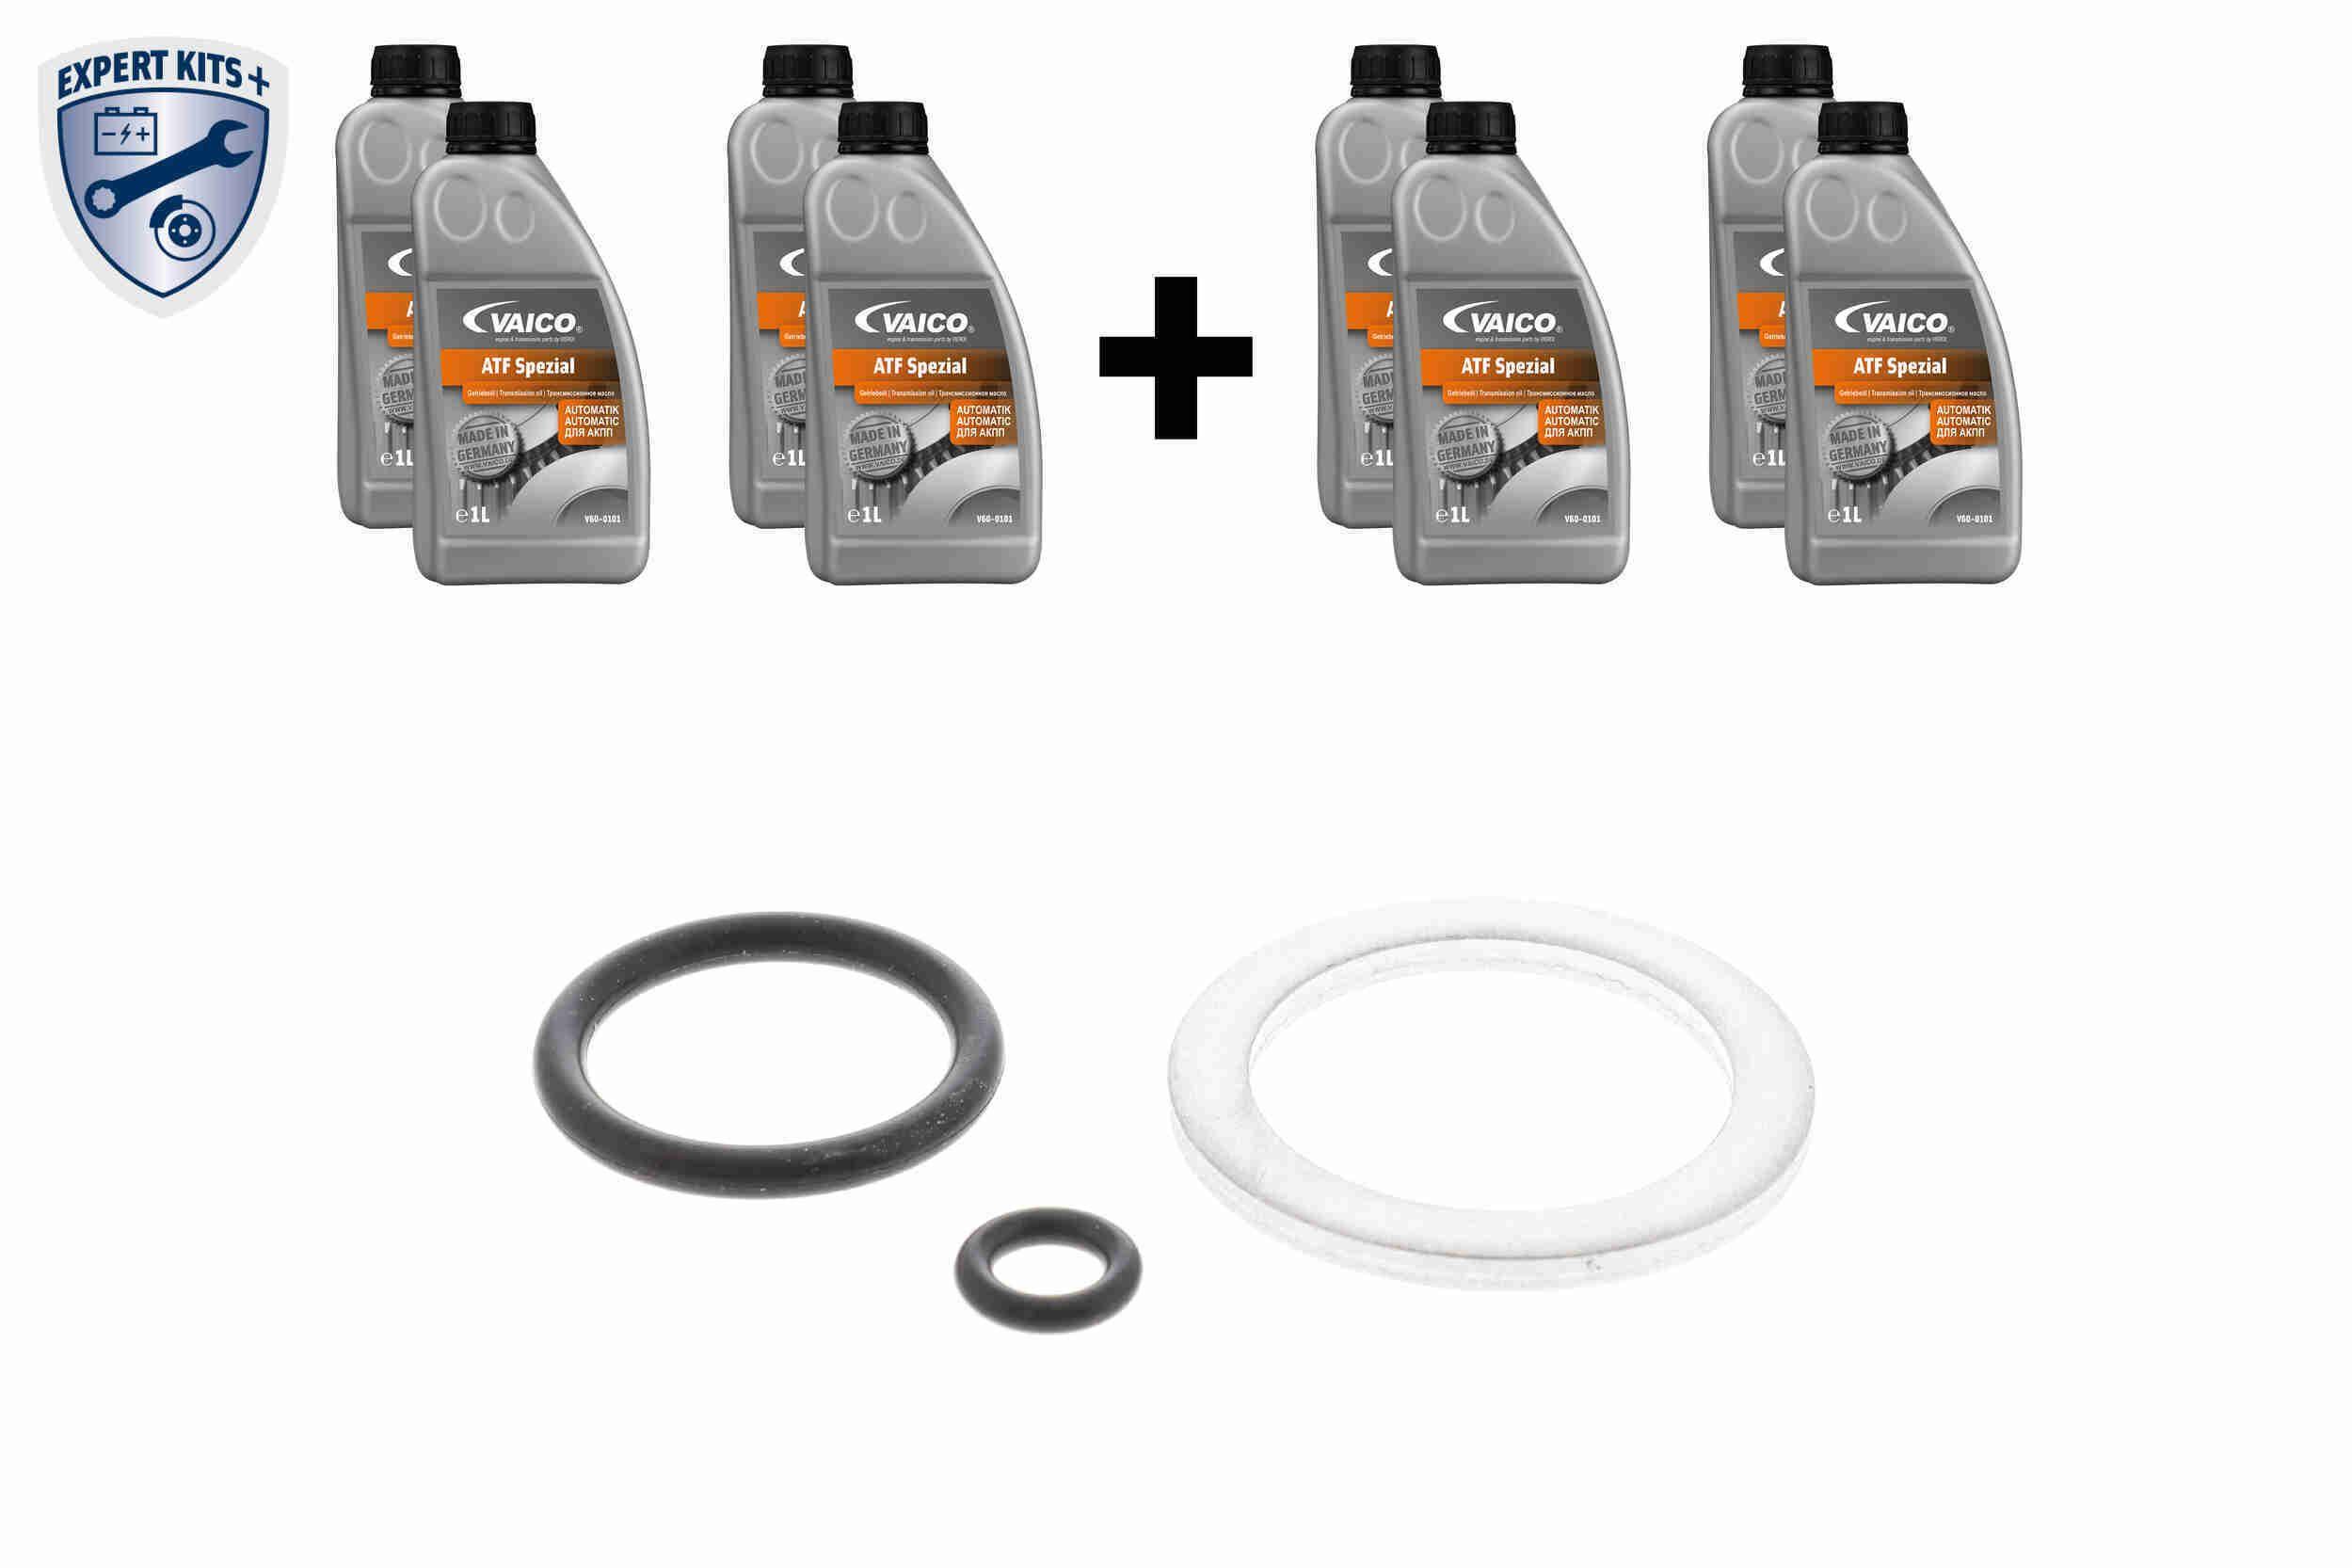 OPEL OMEGA 1998 Teilesatz, Ölwechsel-Automatikgetriebe - Original VAICO V40-1605-XXL